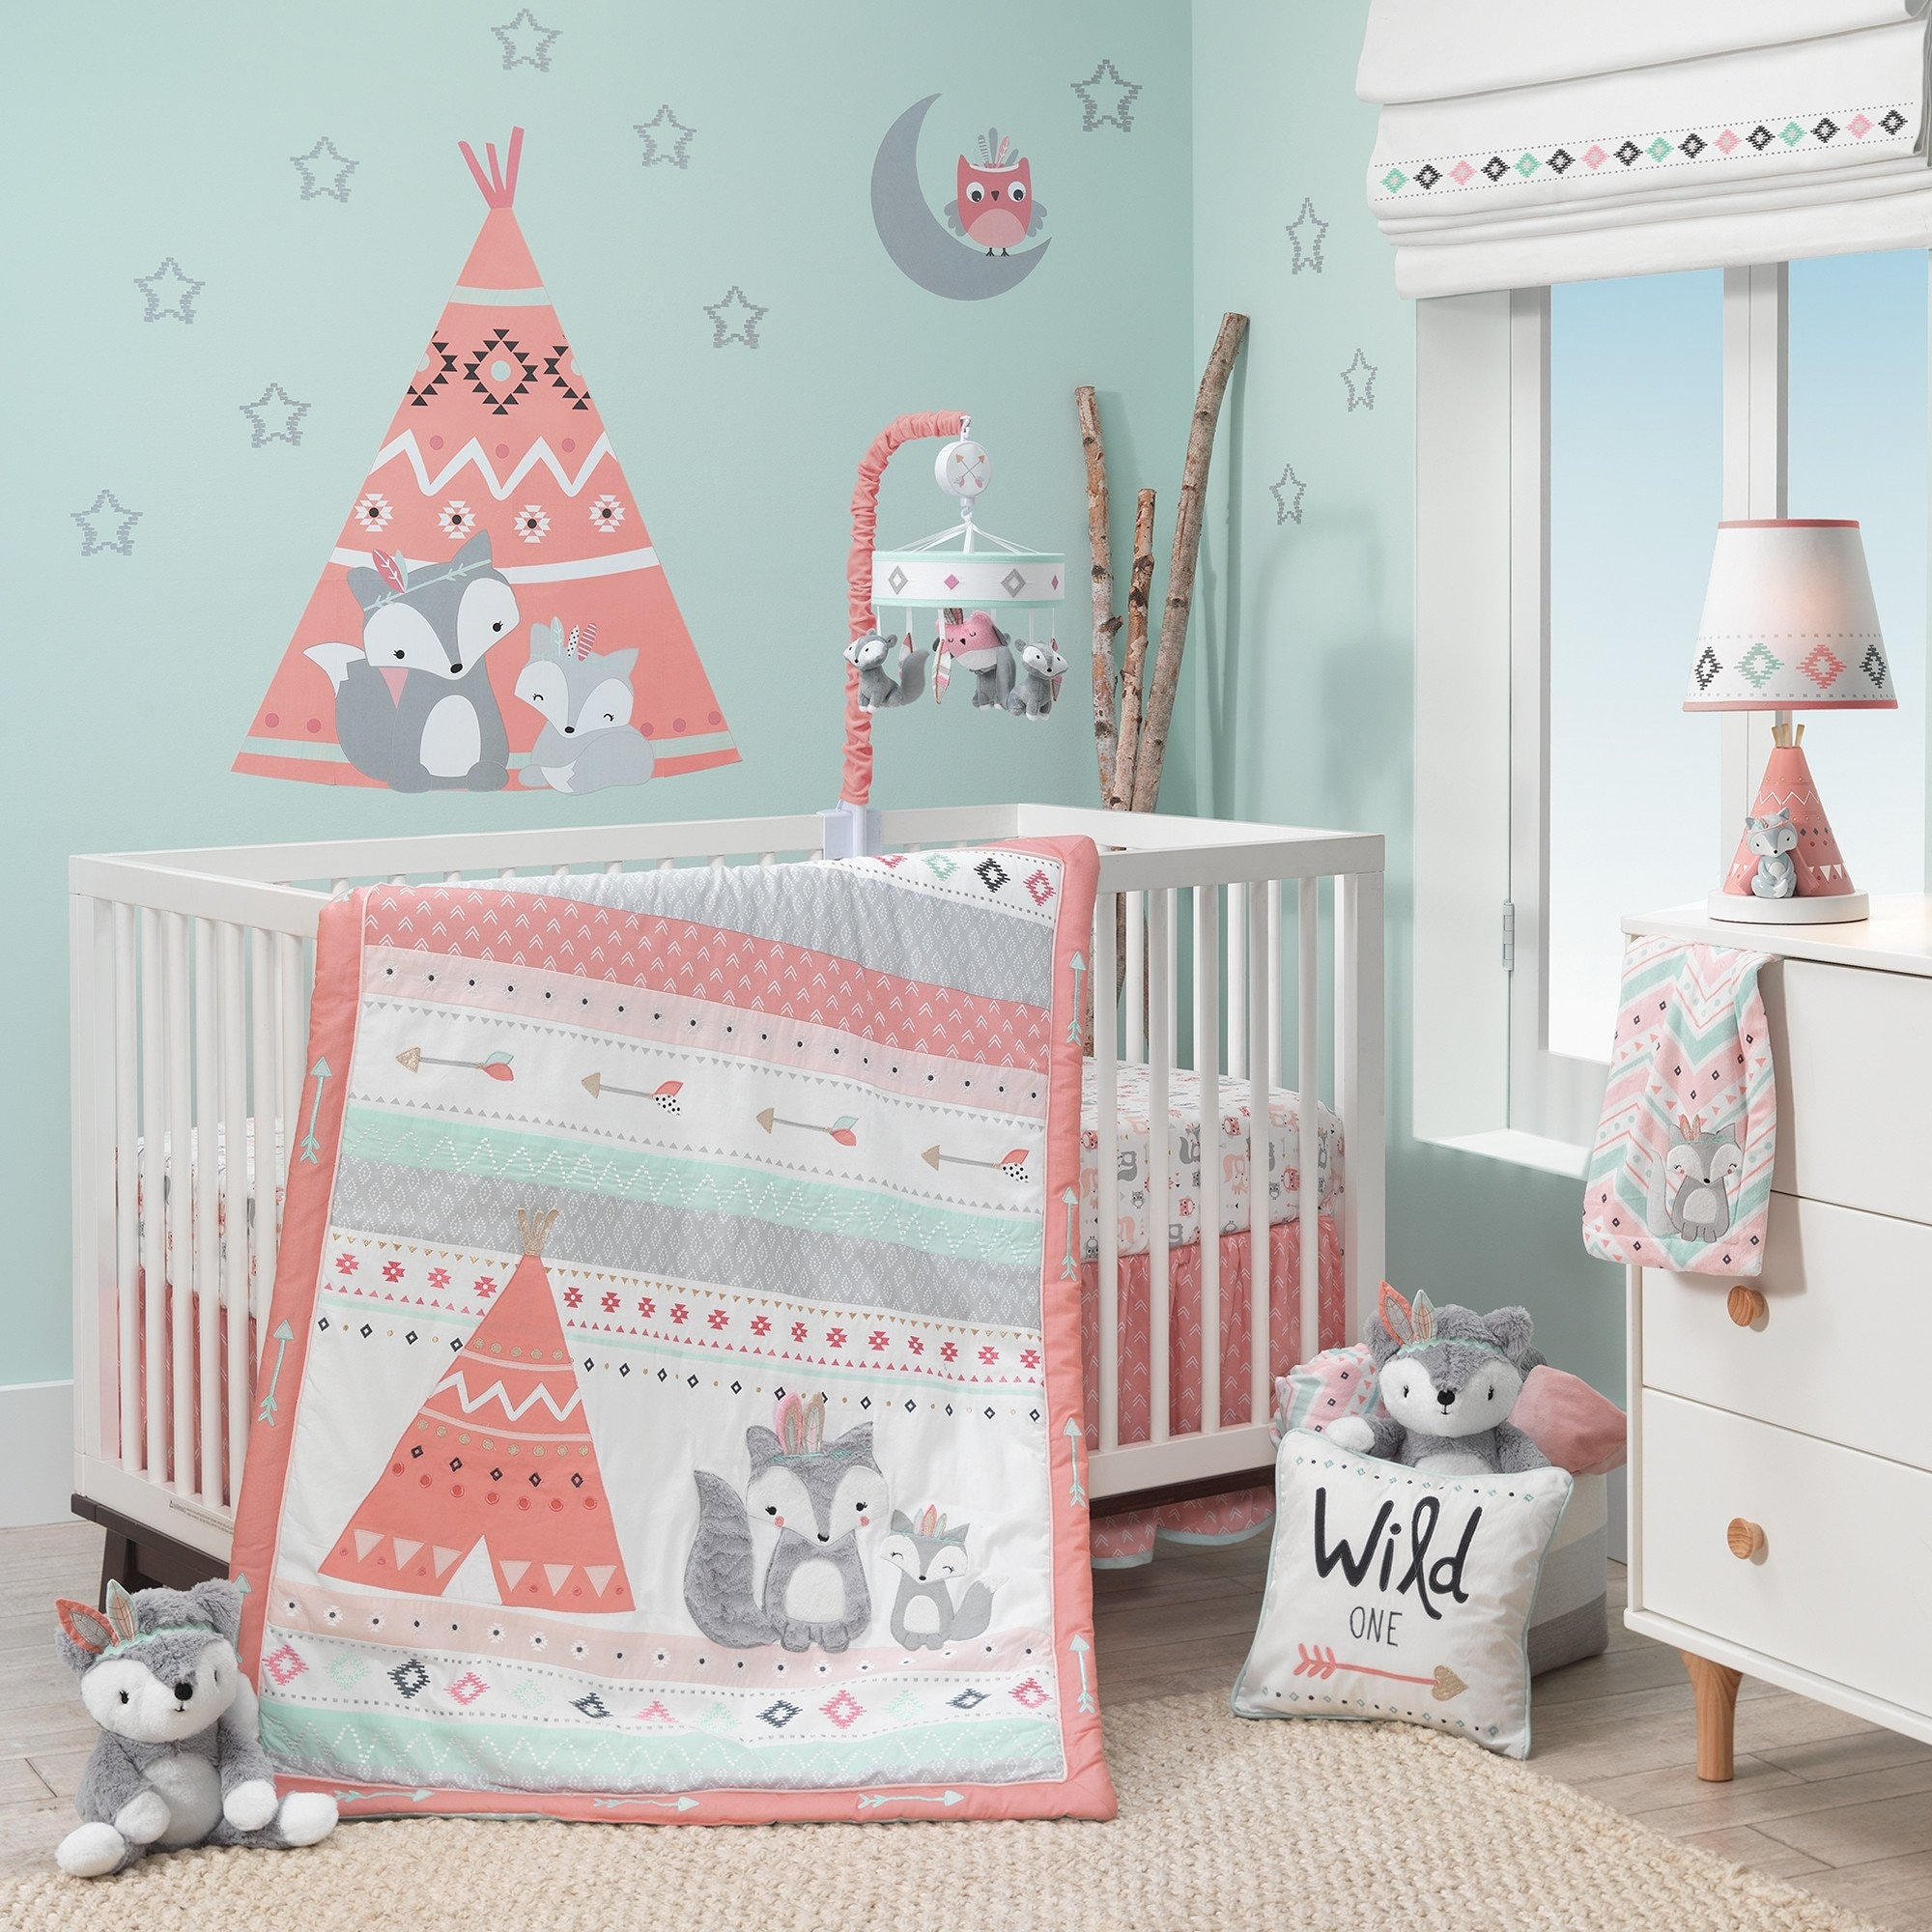 Lambs Ivy Little Spirit Coral Mint Gray Southwest Fox Teepee Nursery 3 Piece Baby Crib Bedding Set On Sale Overstock 23500189